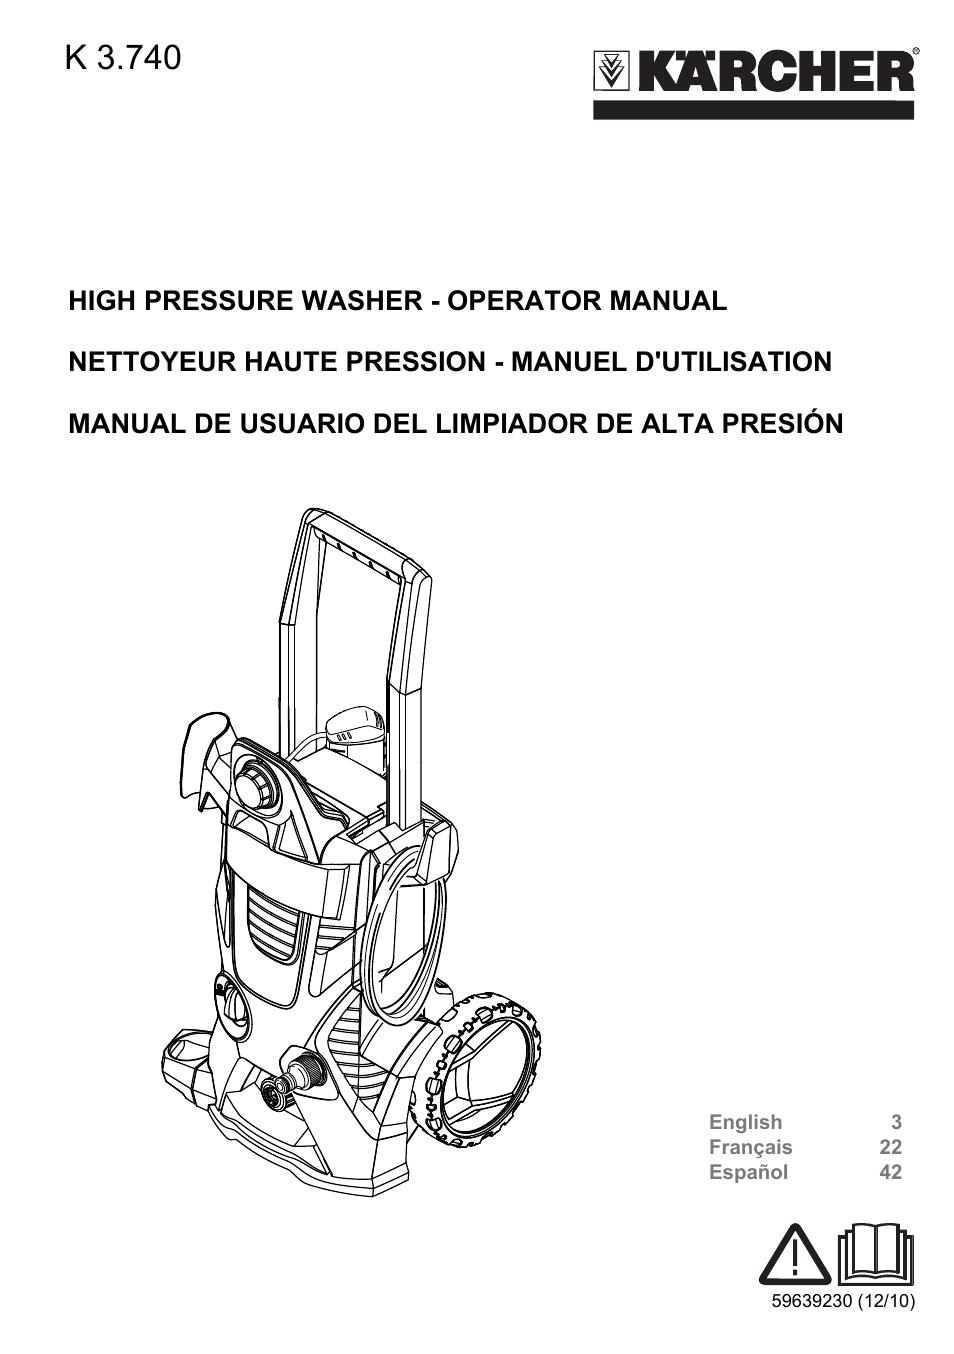 karcher k 3 740 user manual